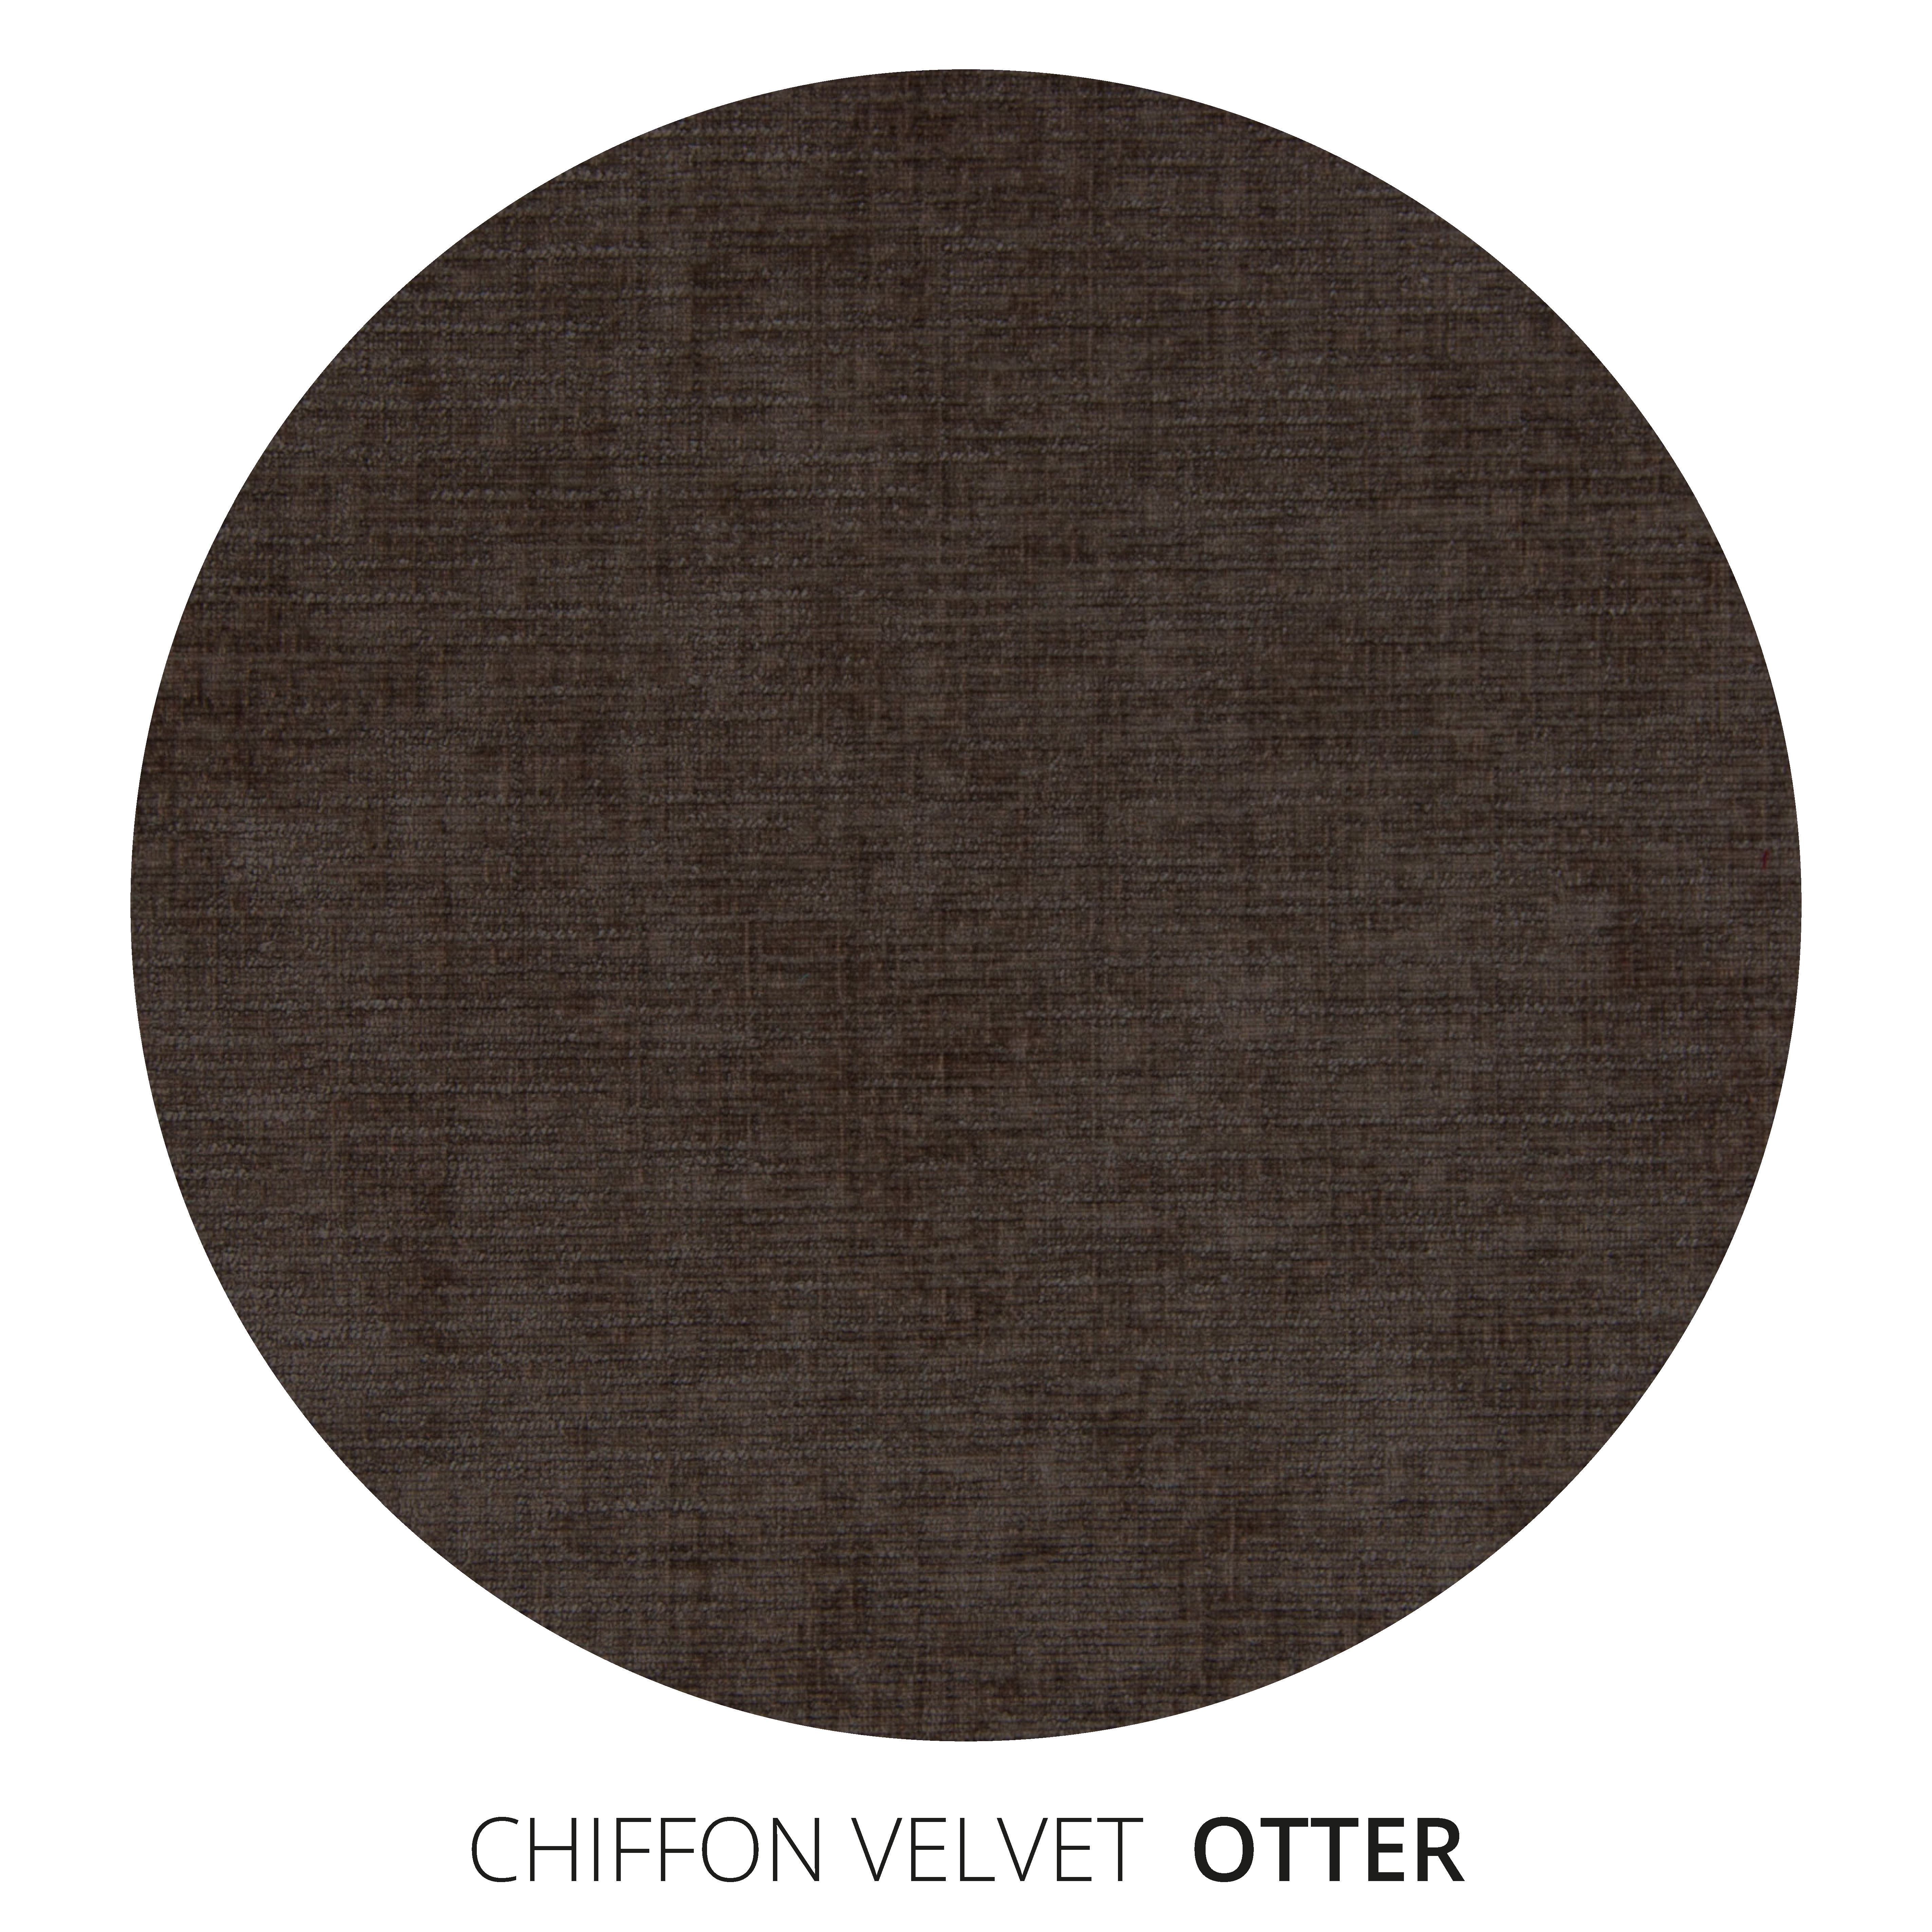 Otter Chiffon Velvet Swatch